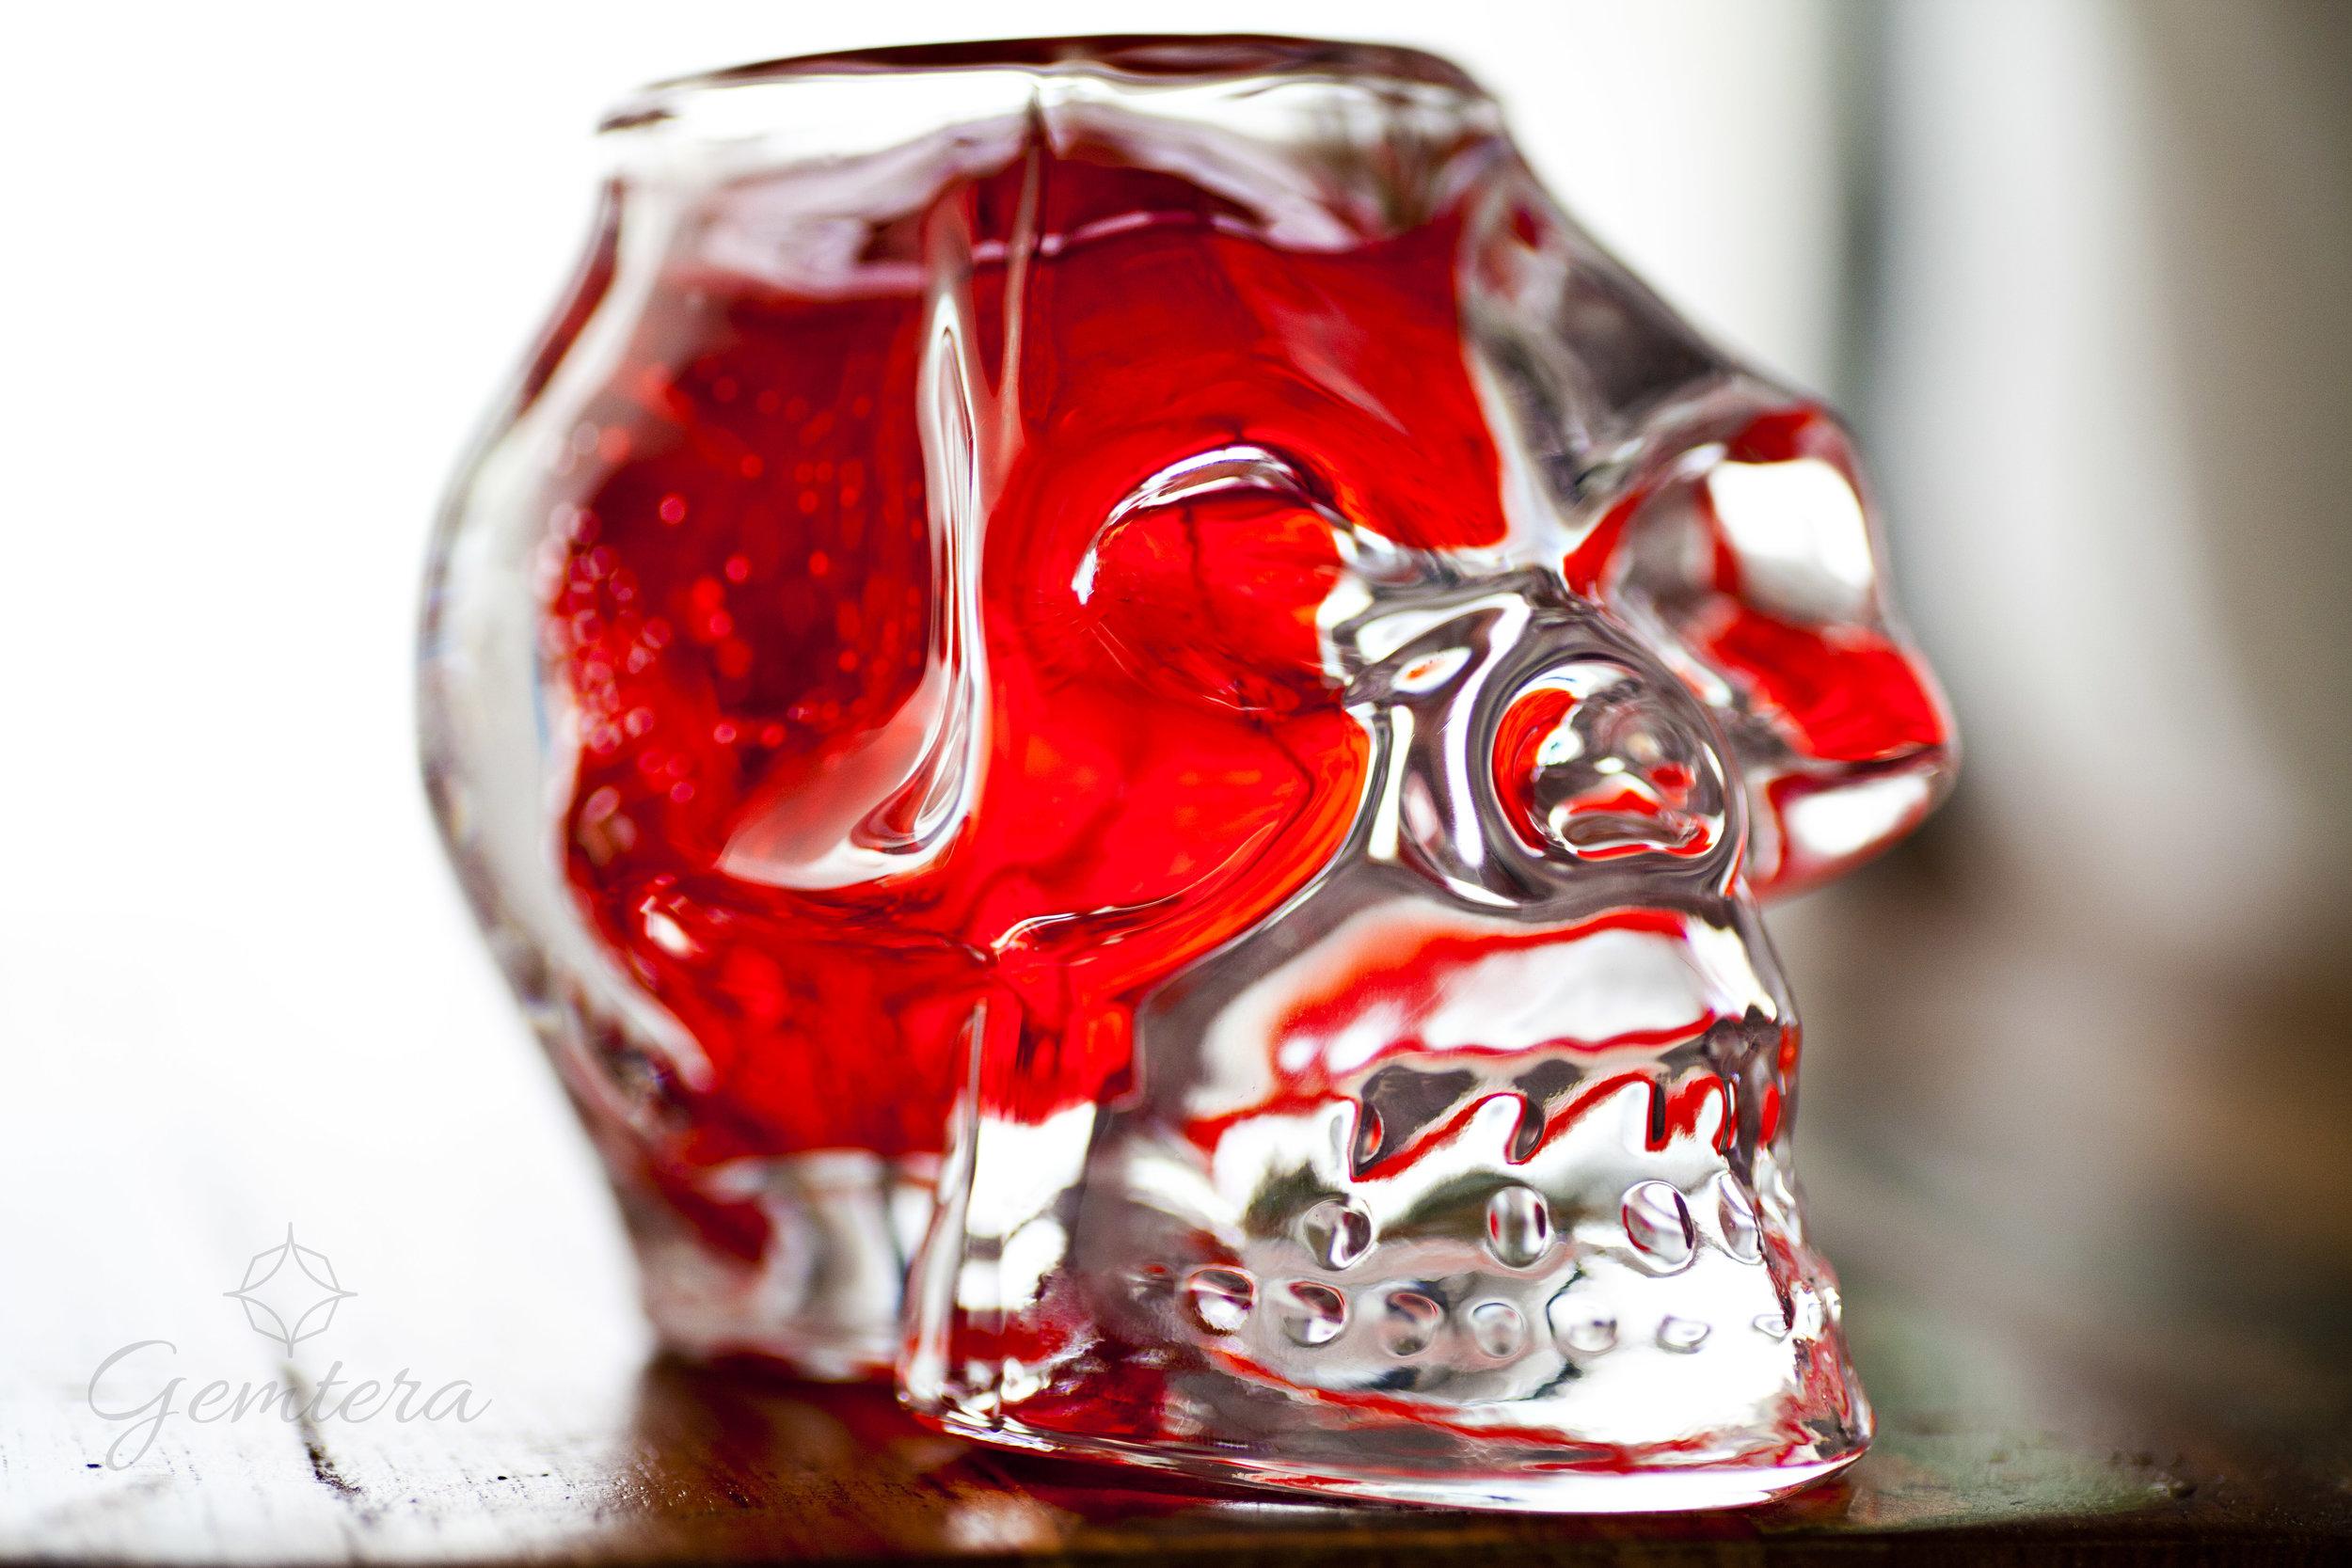 Skull Candle - Crystal Skull - Burn time: 50 hours